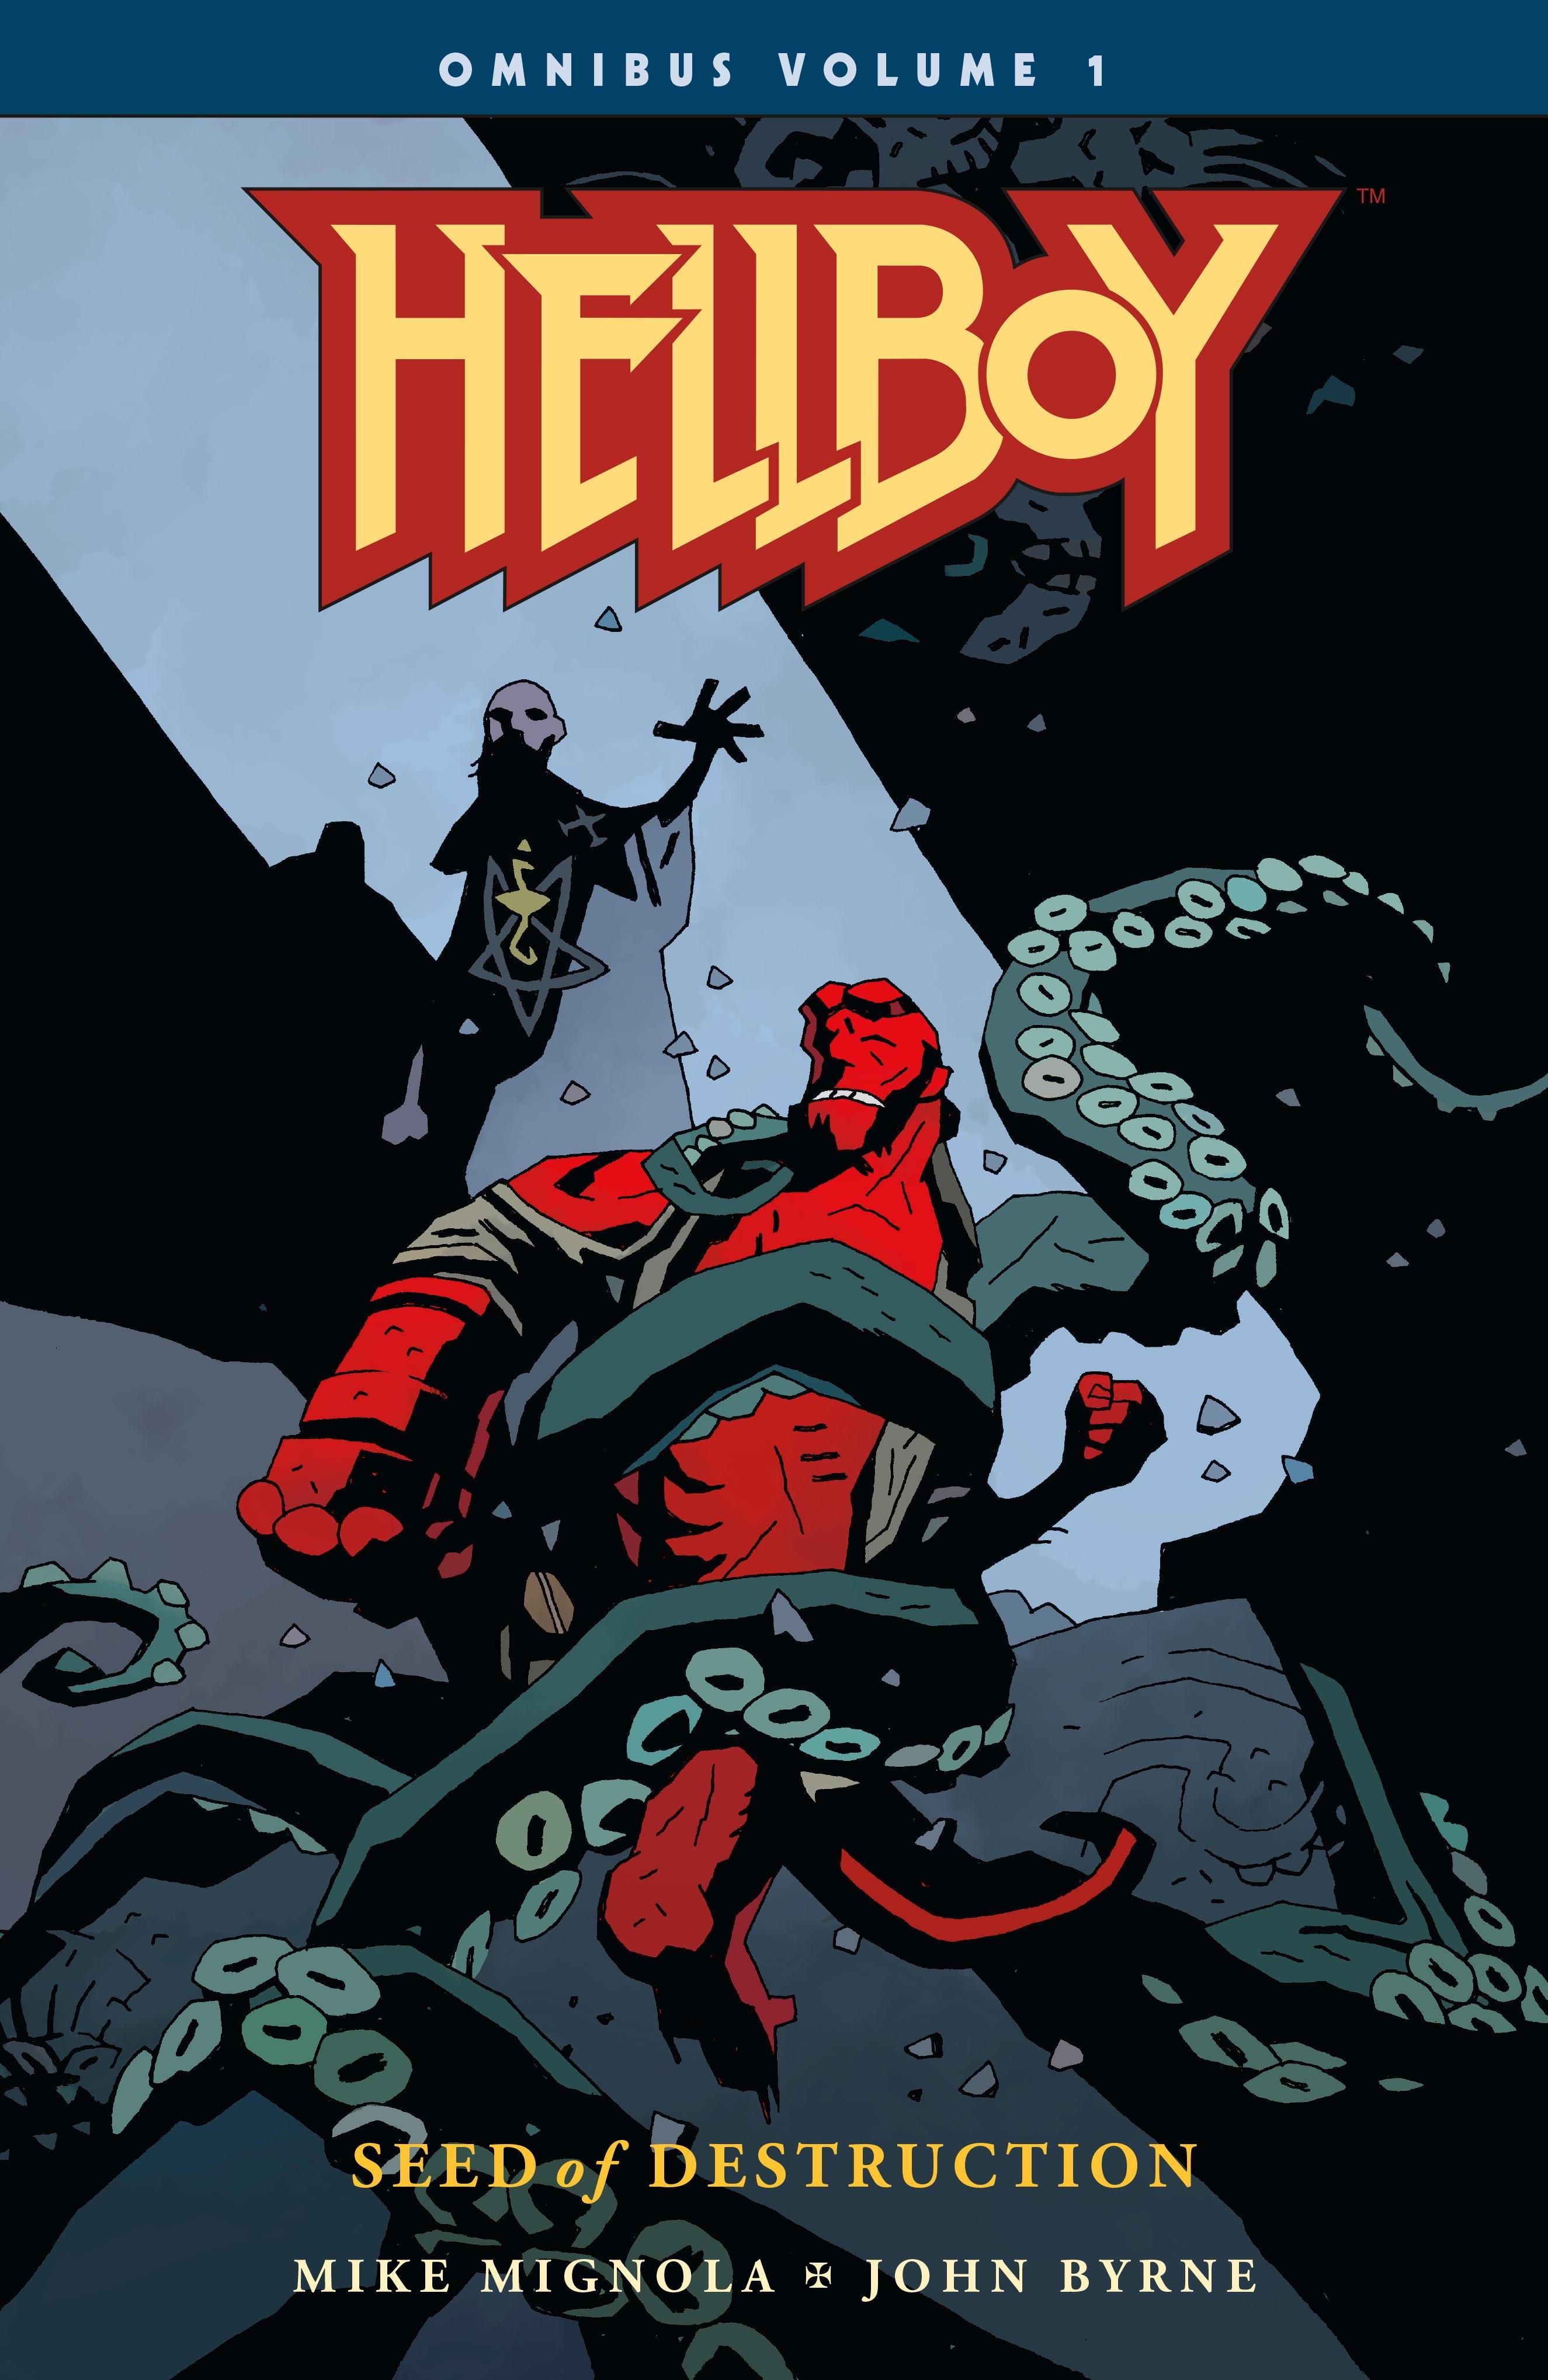 Hellboy Omnibus Volume 1 Seed Of Destruction by Mike Mignola